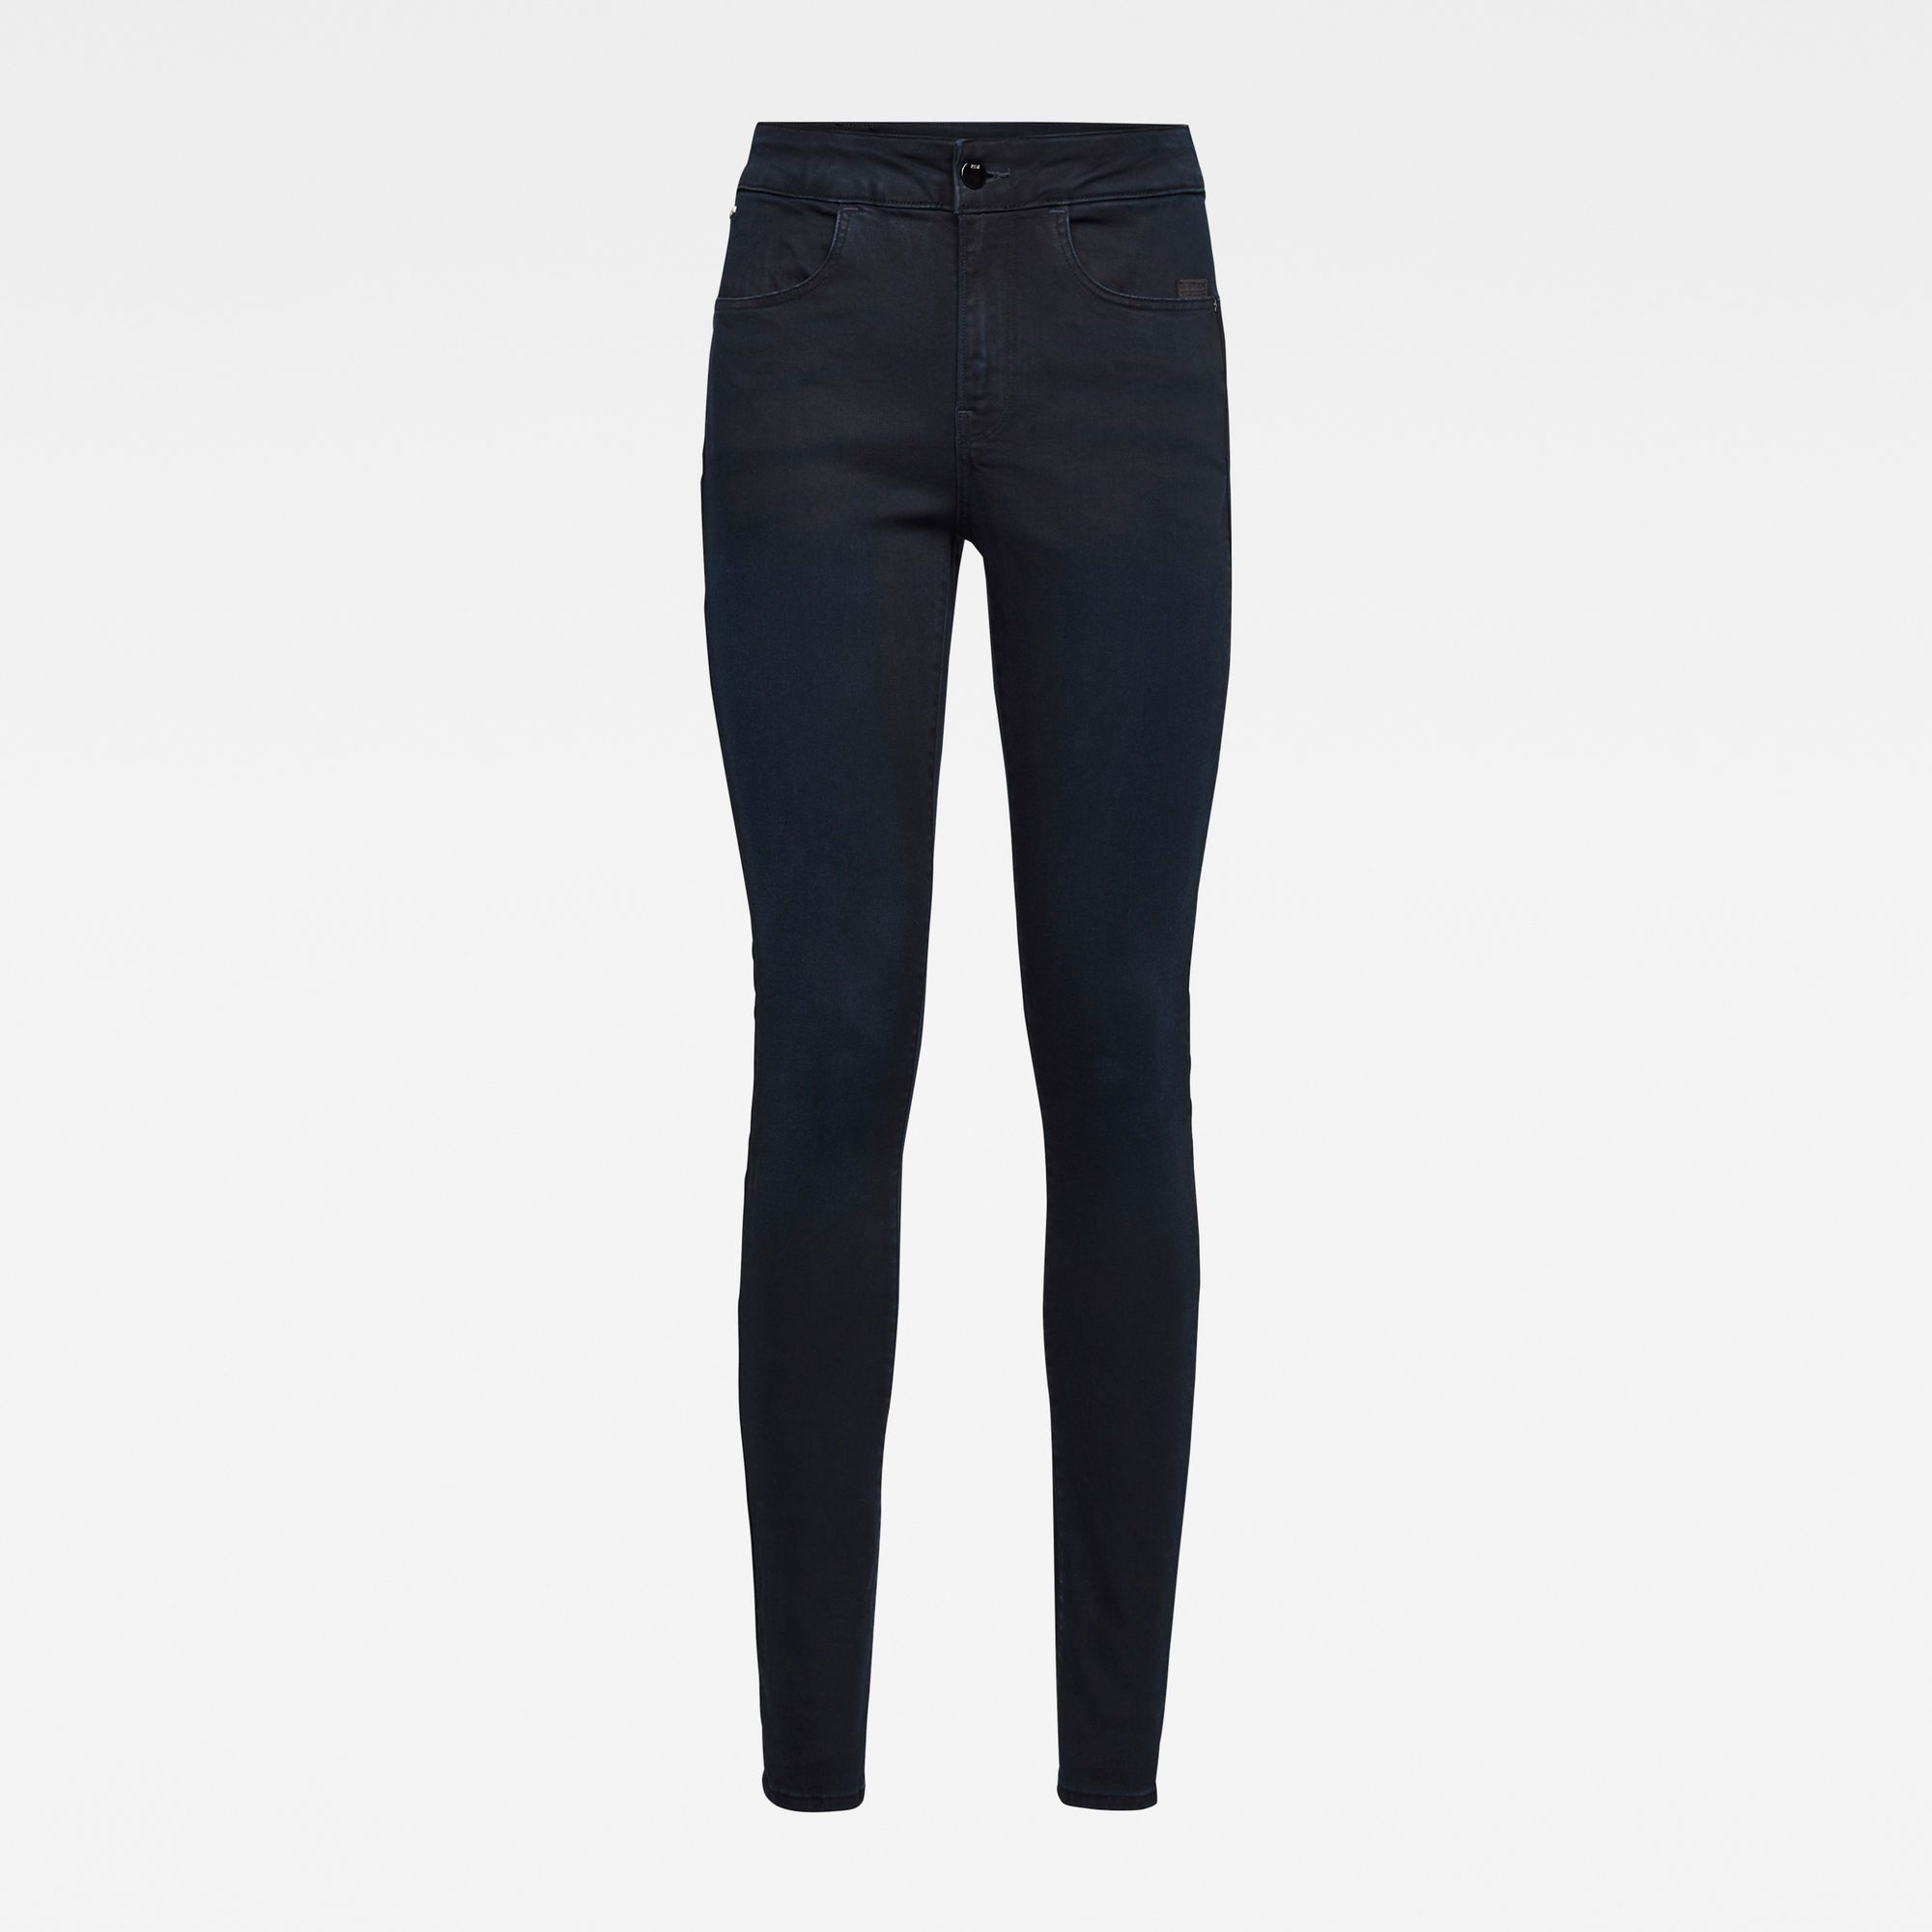 G-Star RAW Citi-You High Super Skinny Jeans